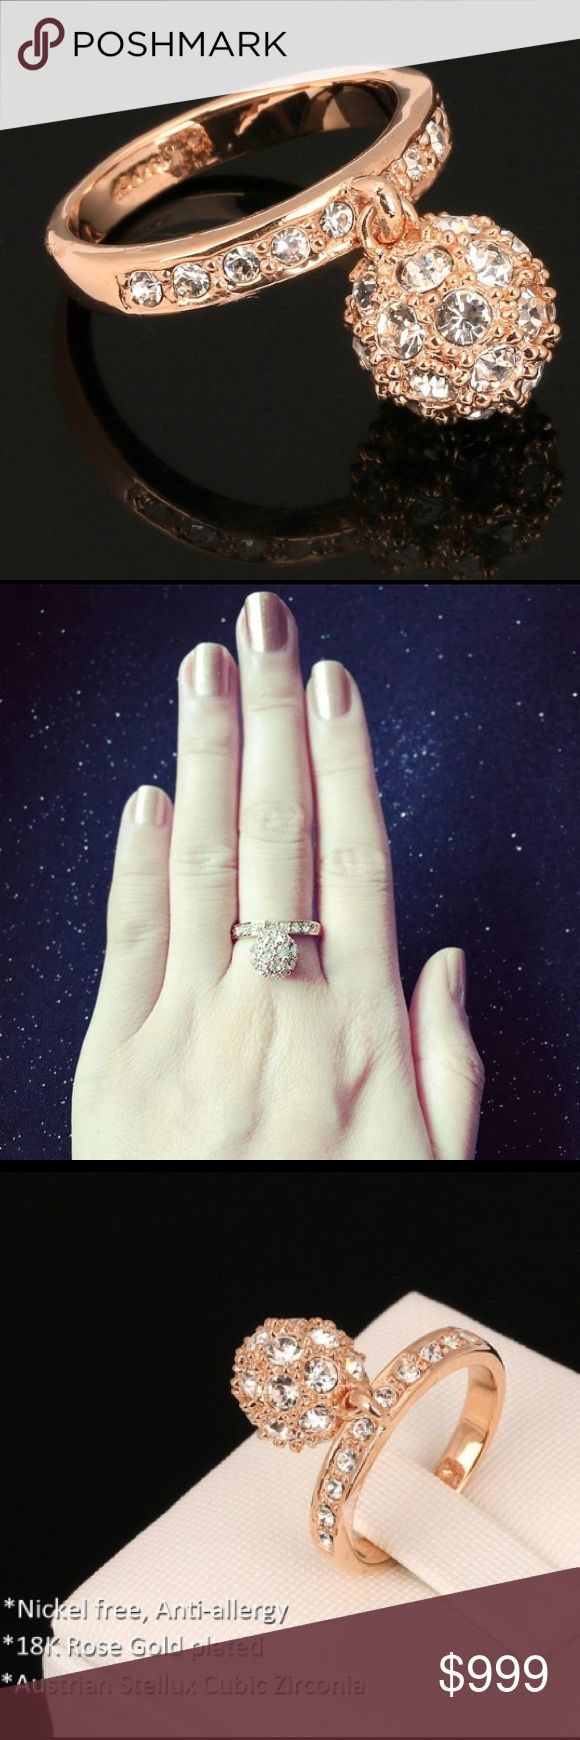 197 best Finger Wear images on Pinterest | Wedding ring, Jewelry ...